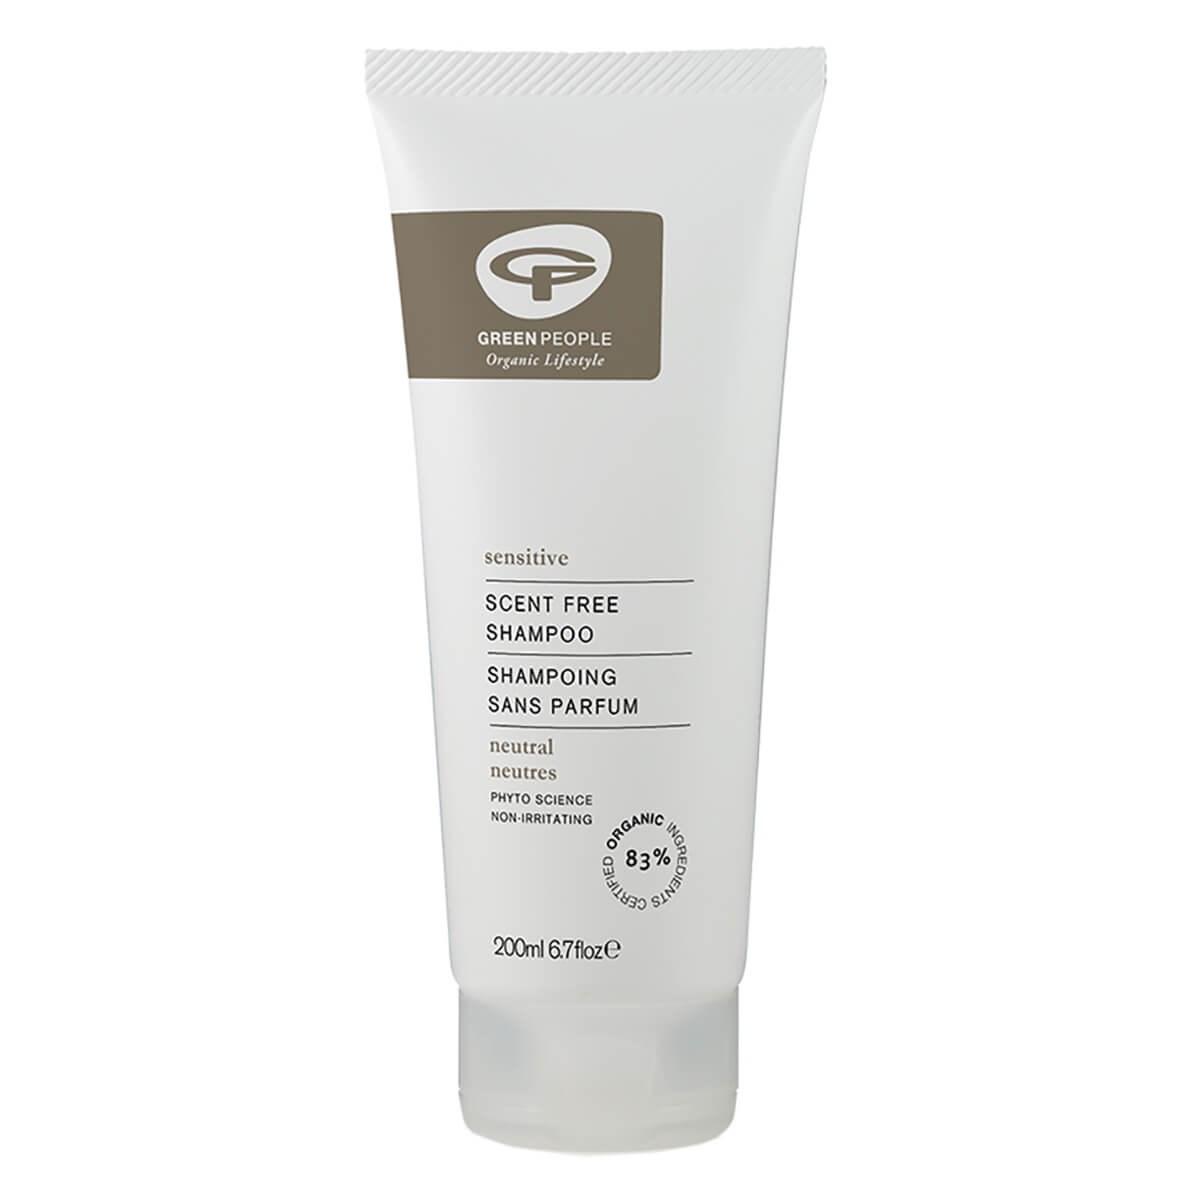 Green People Organic Neutral/Scent Free Shampoo